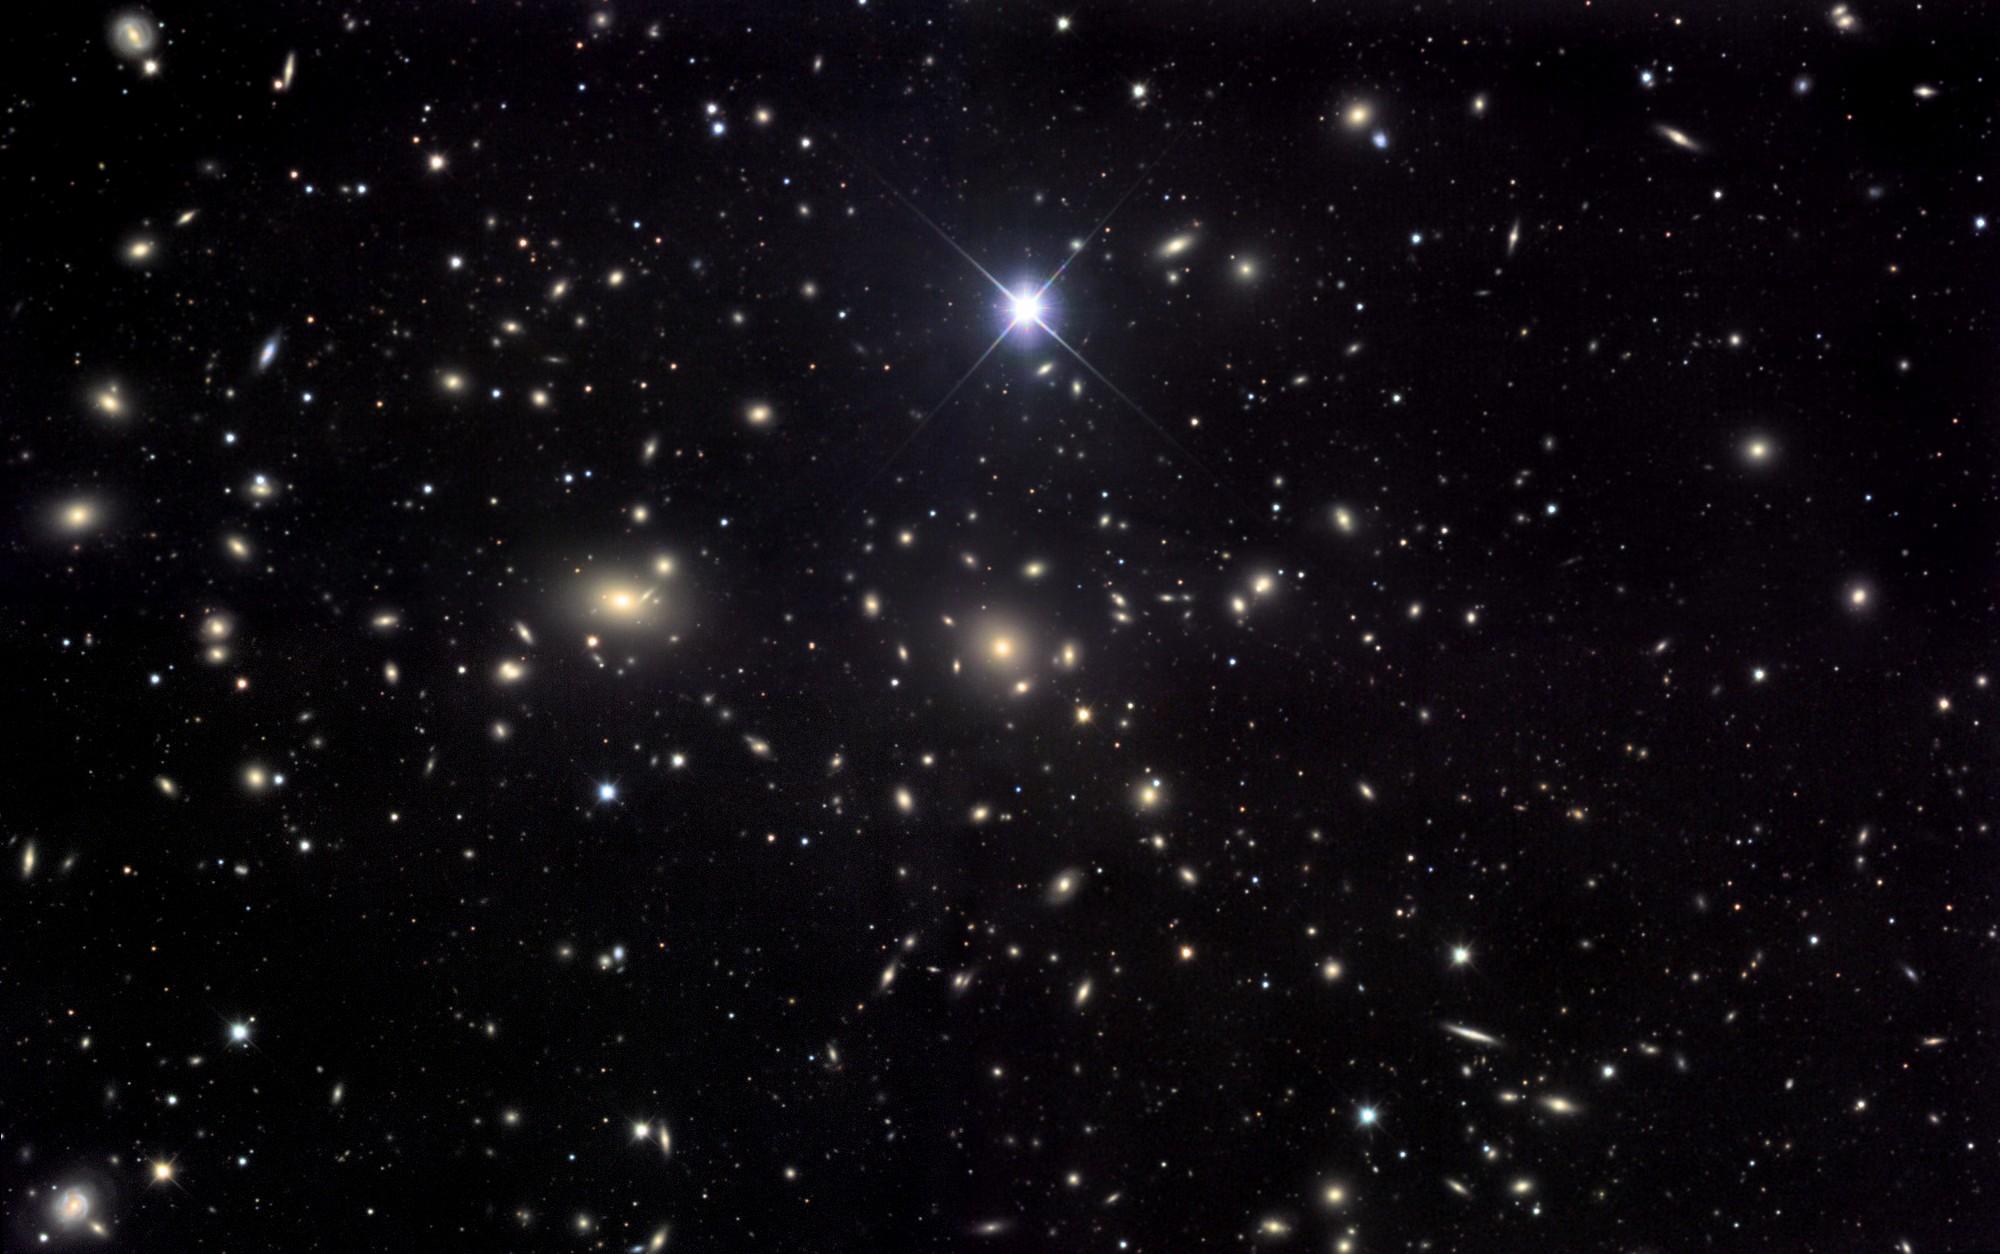 stars at night wallpaper - photo #45